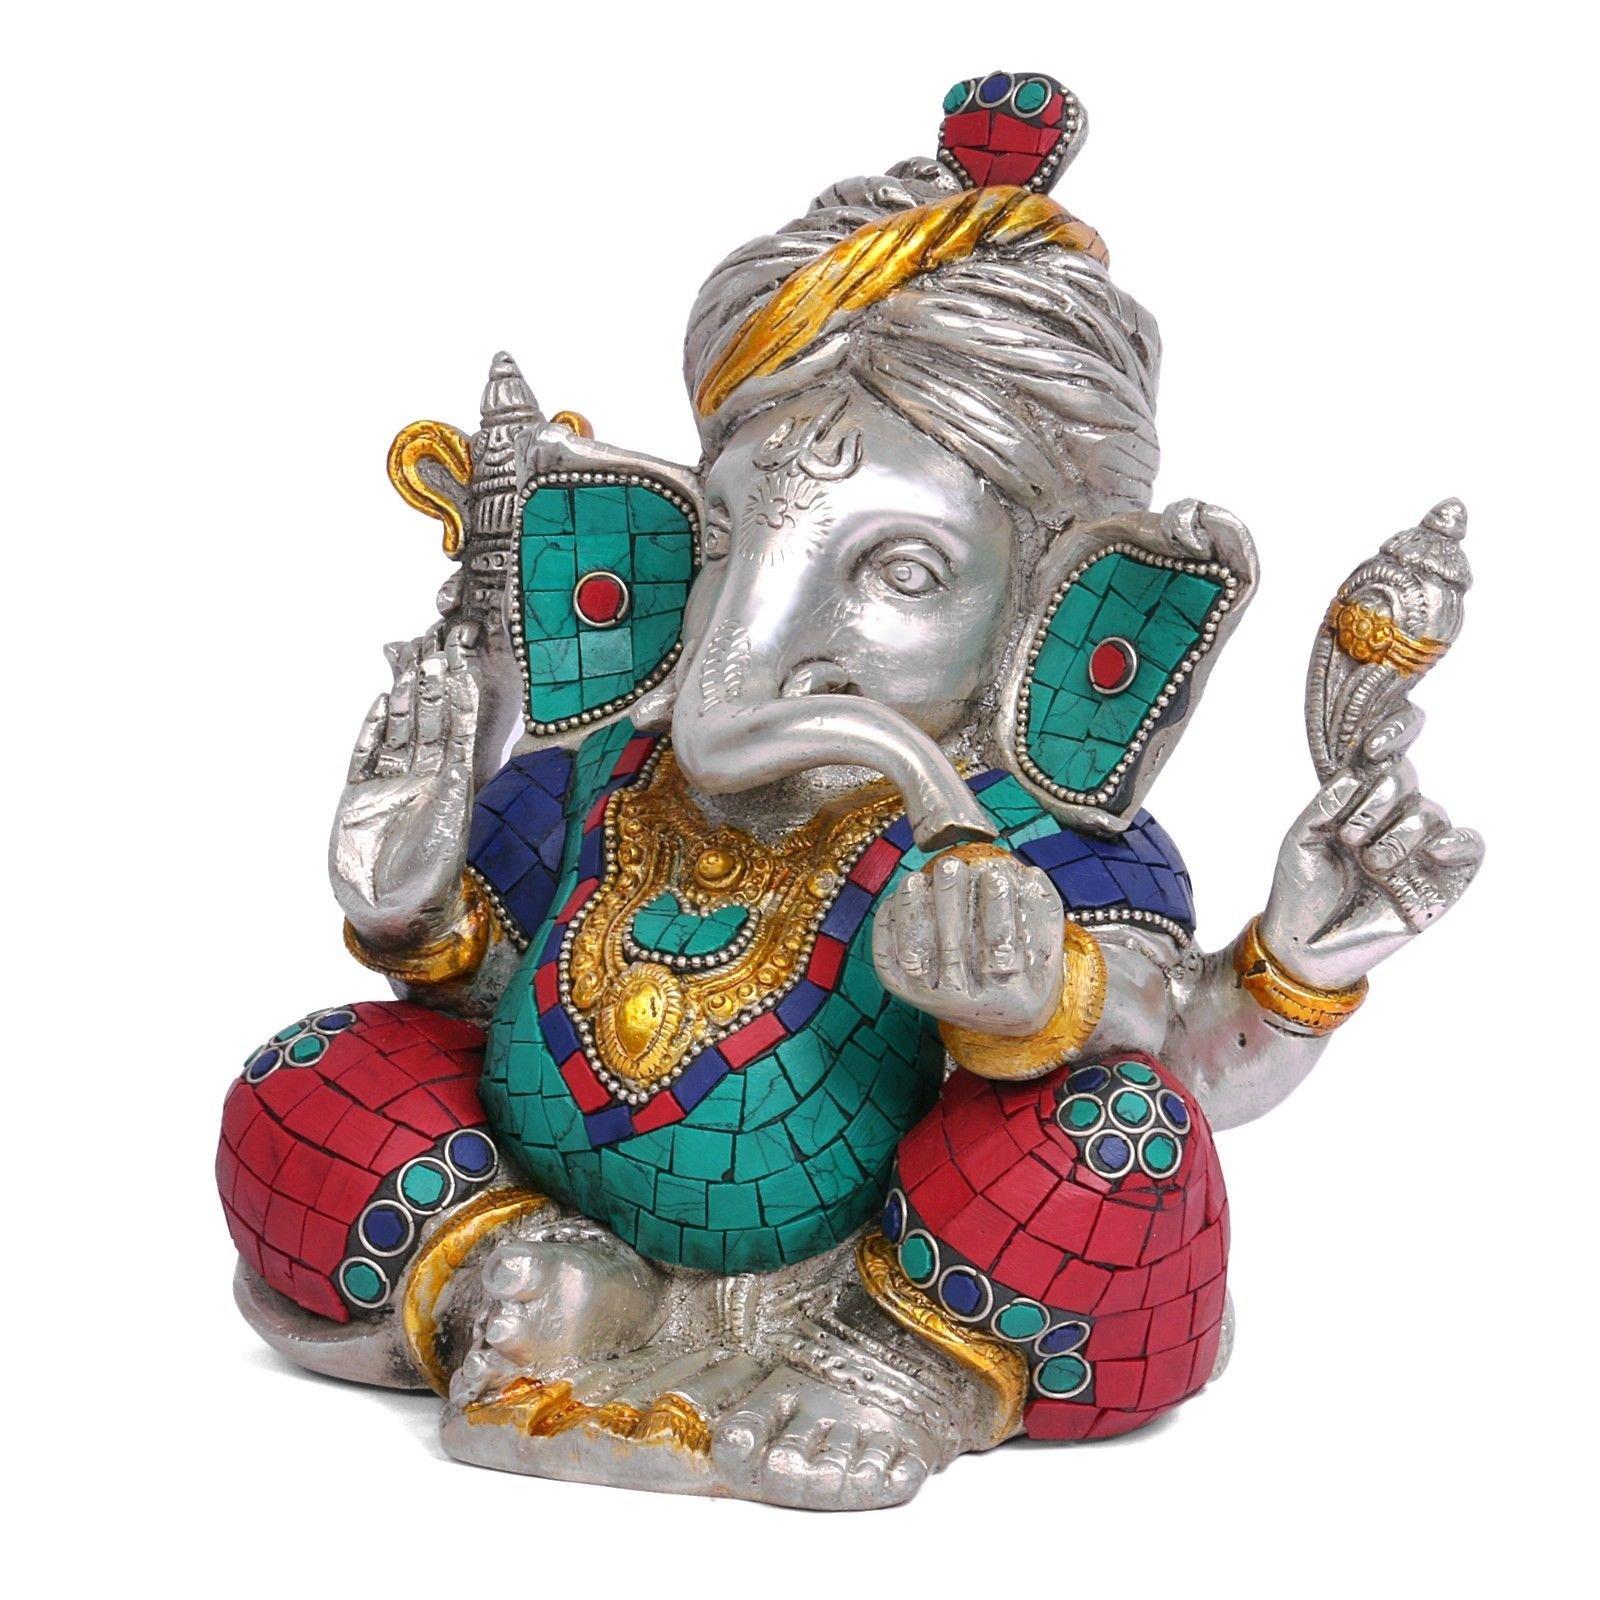 Safa Ganesh Statue Hindu God Figurine Brass Sculpture Ganesha Idol Home Decor Gift by CraftVatika (Image #2)